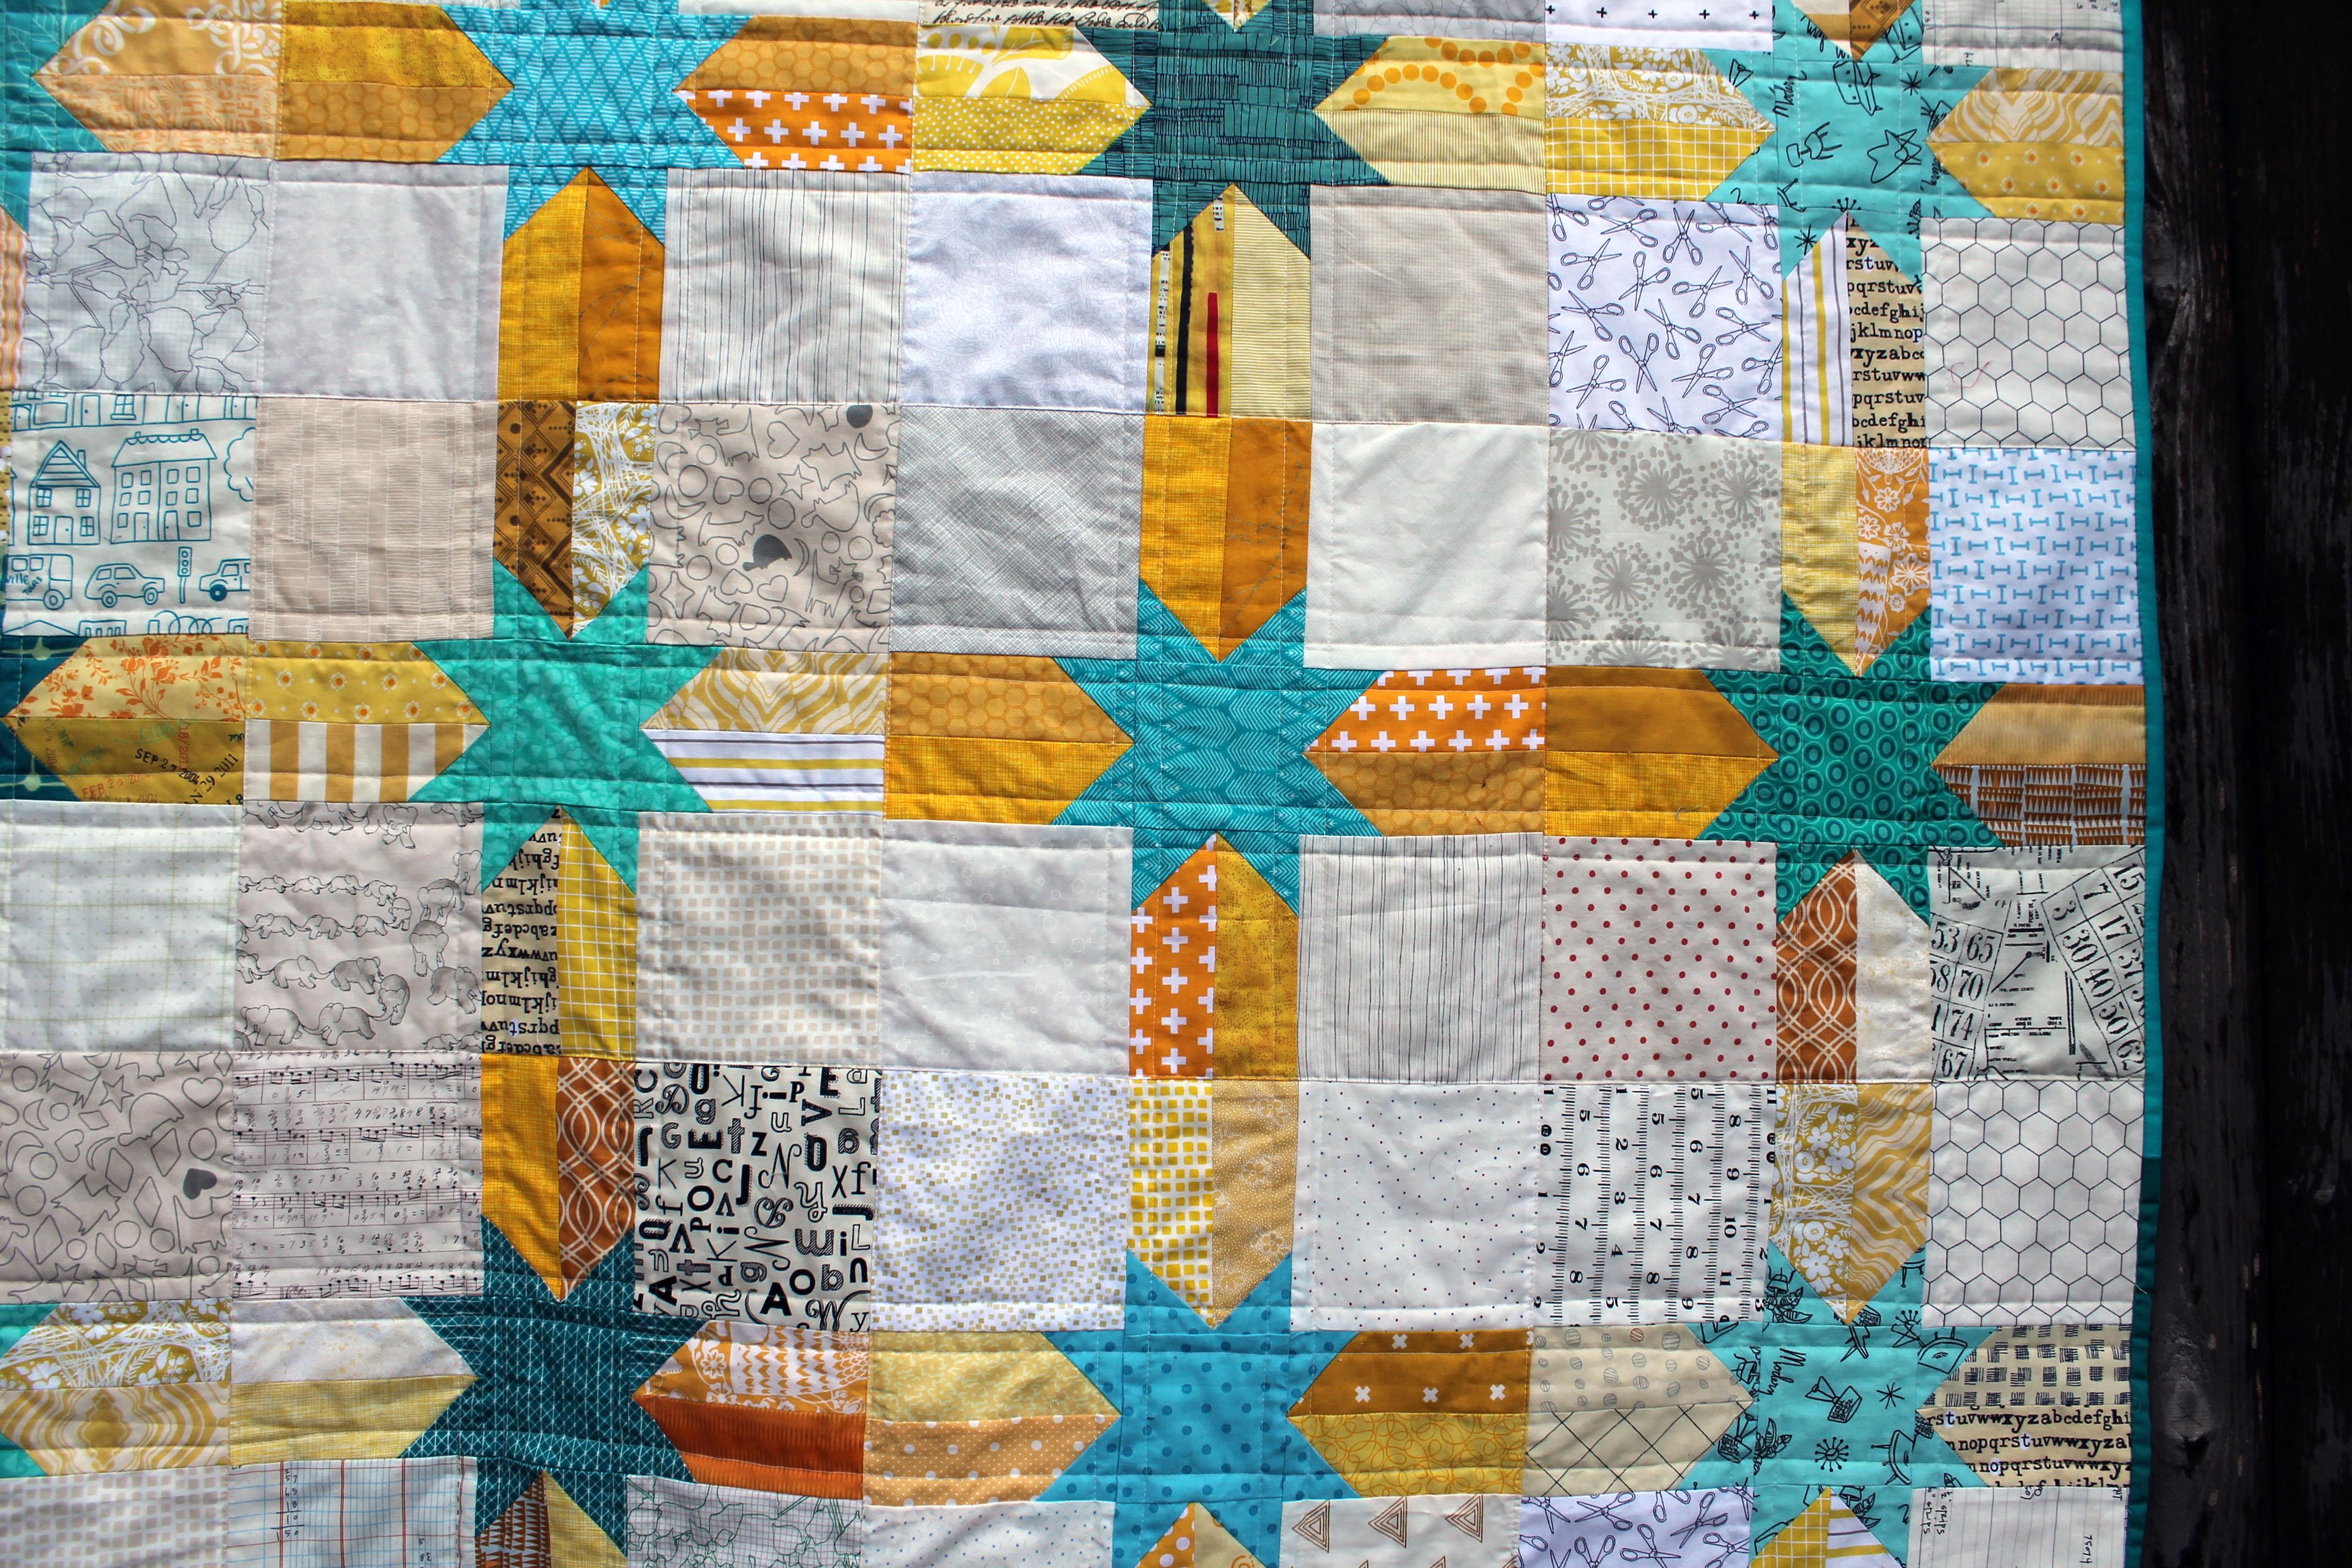 quilt detail 3